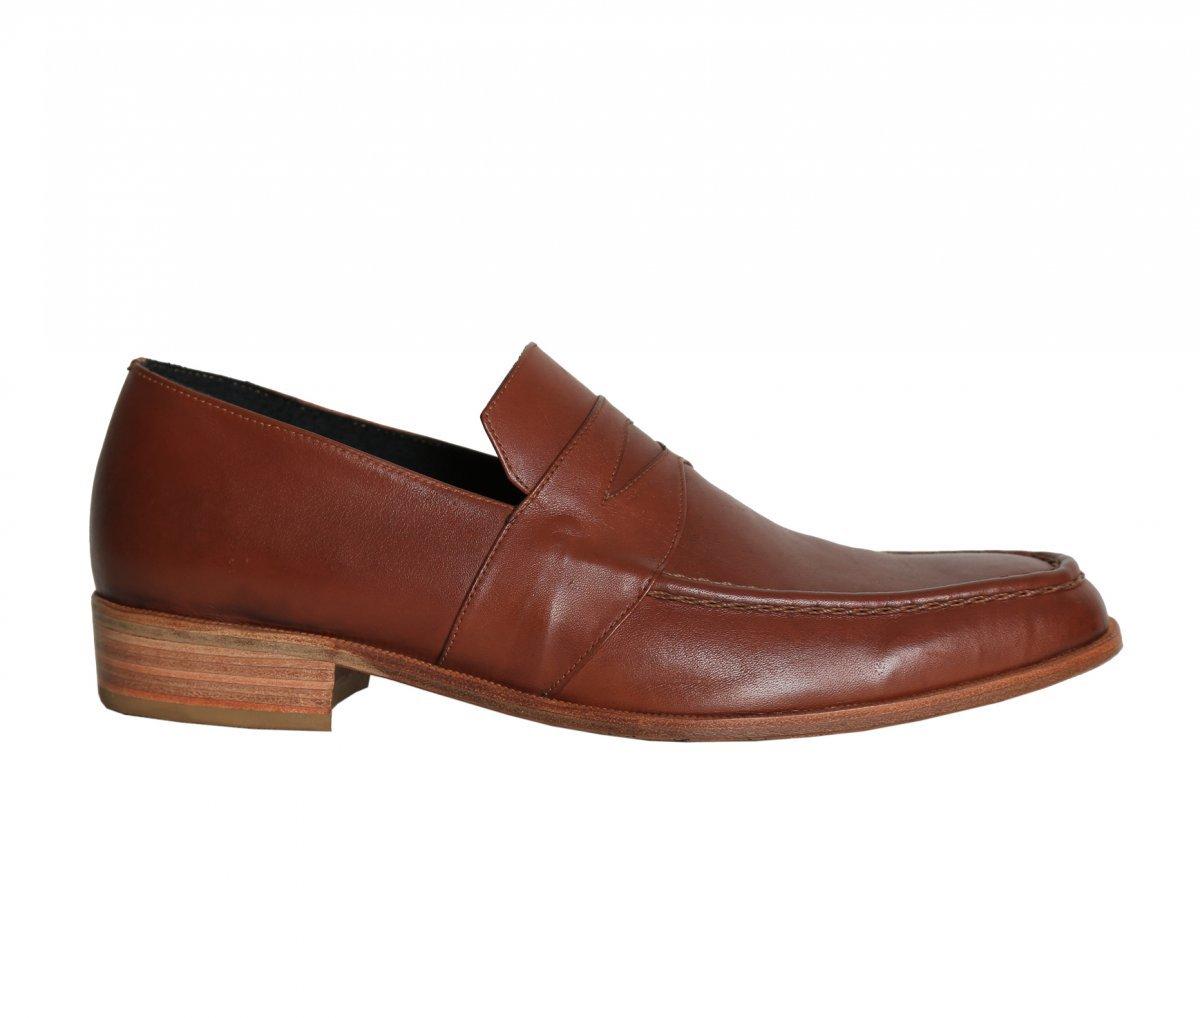 f4a280d2a8 Sapato Social de Couro Loafer Feito a Mão   E. Marchi.